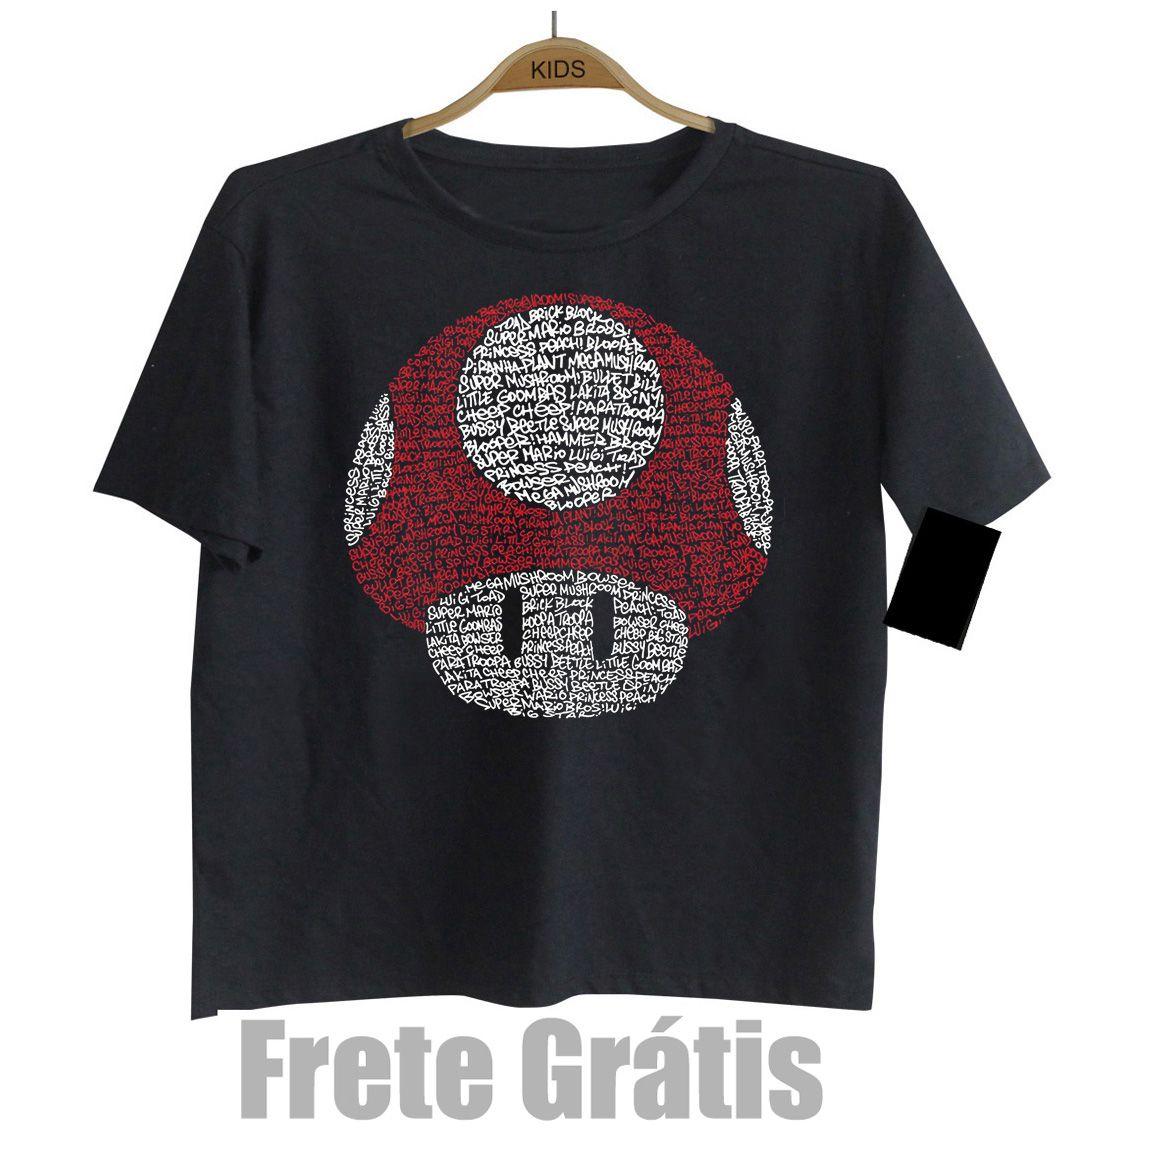 Camiseta Infantil Divertida Nerd Geek -  Mario Cogumelo - Black  - Baby Monster S/A